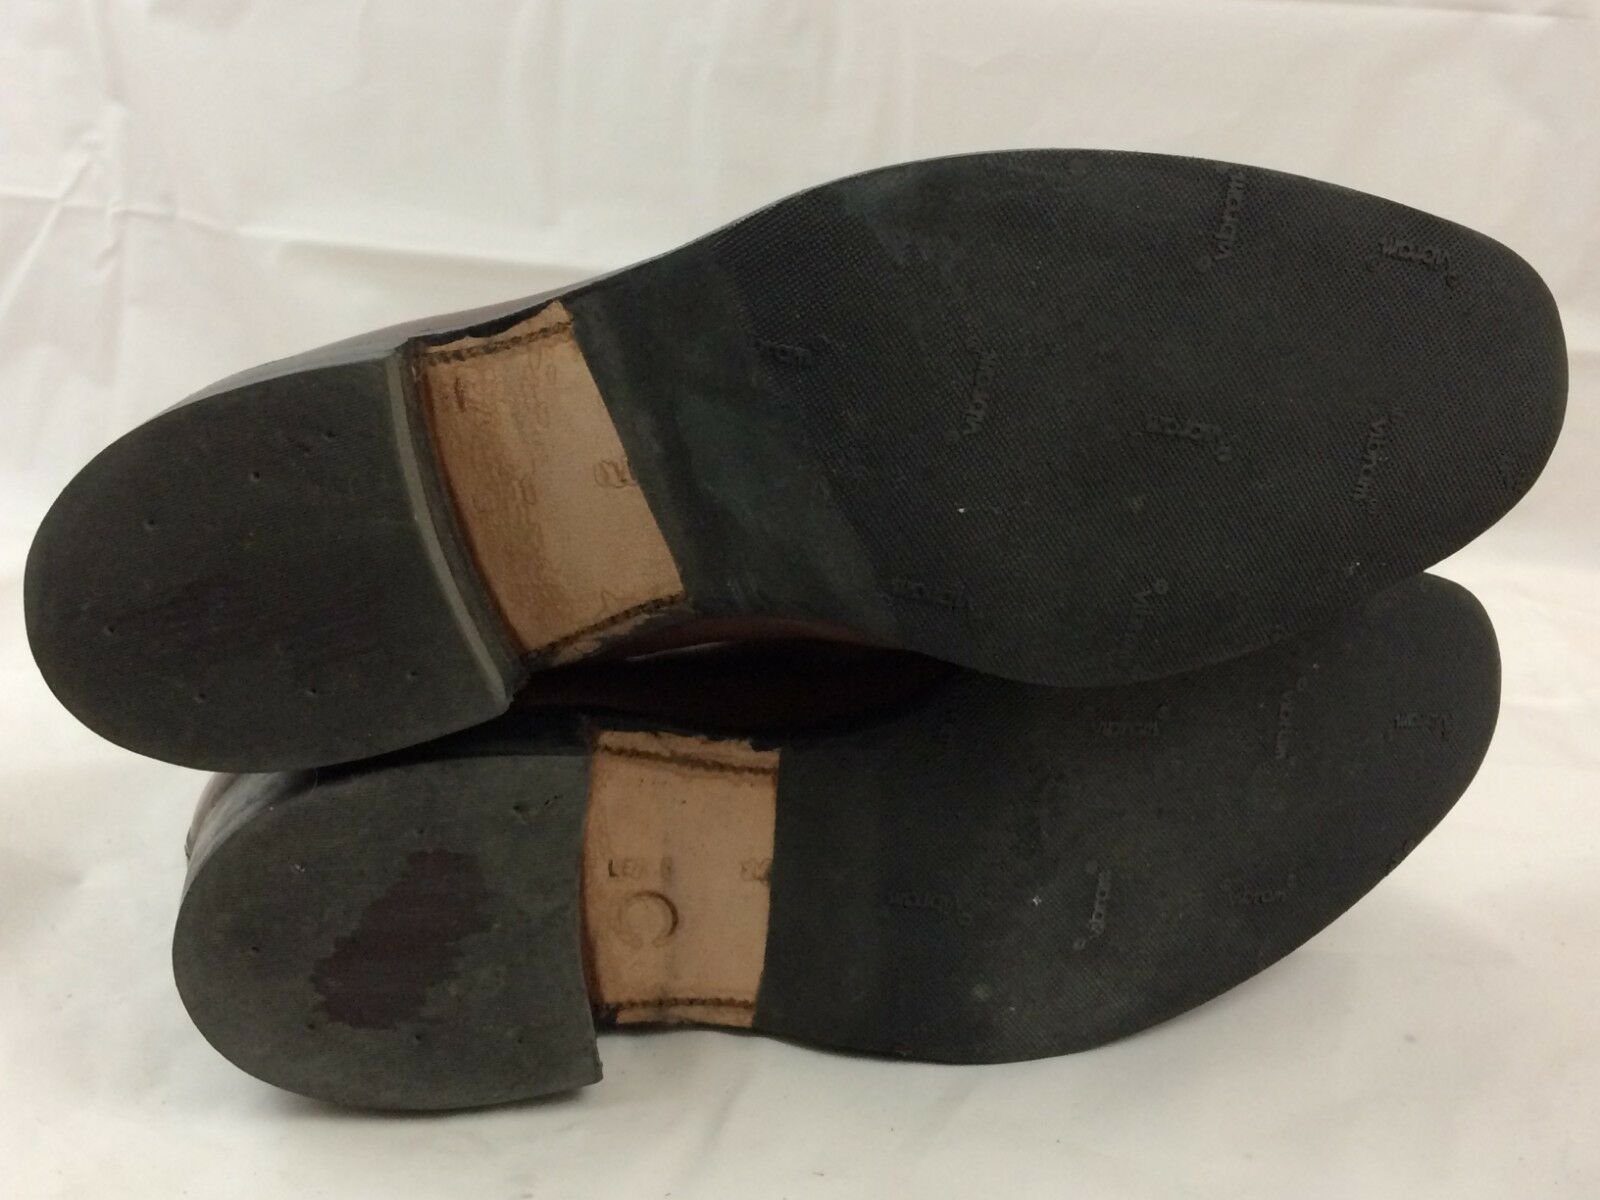 Bristol Stiefel 5 Zip Nunn Mens Ankle Bush 7 Med UGMzVqSp